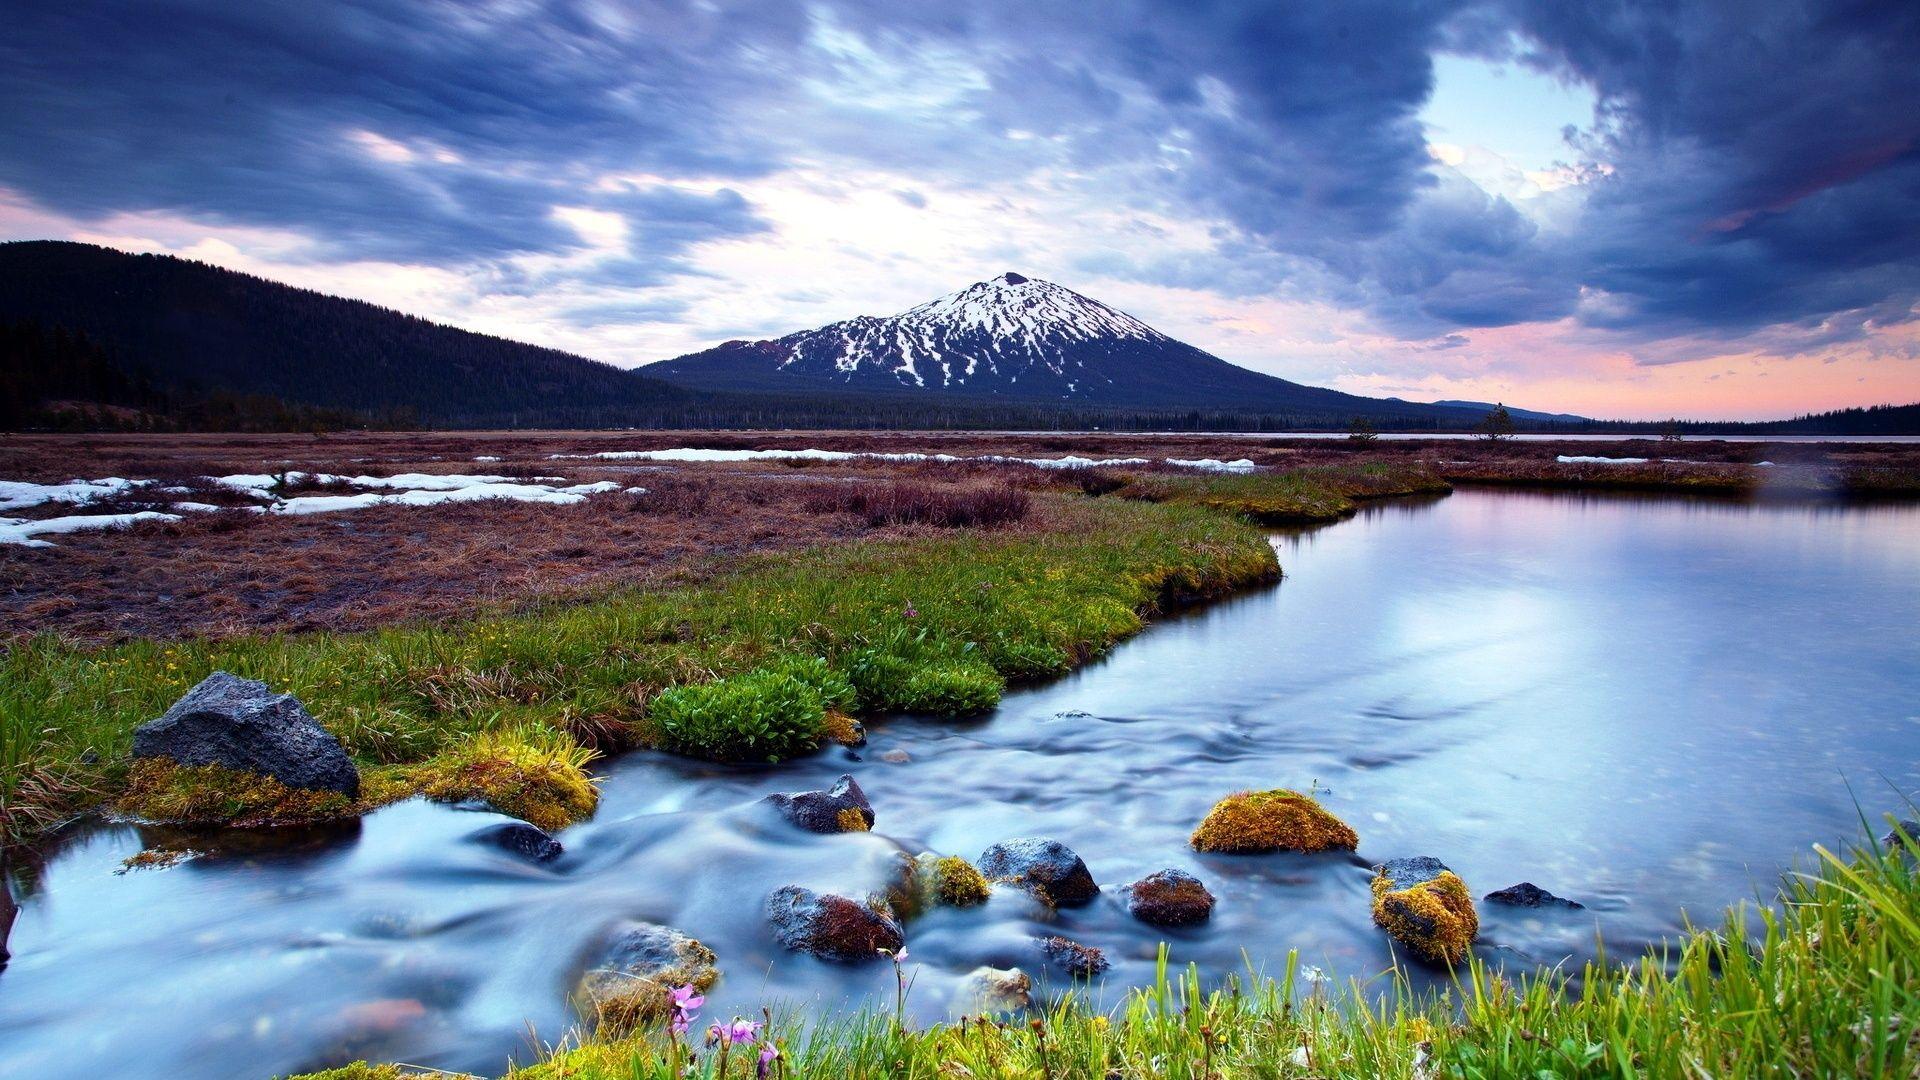 Beautiful River Land Wallpaper Beautiful Landscape Wallpaper Beautiful Landscapes Mountain Landscape